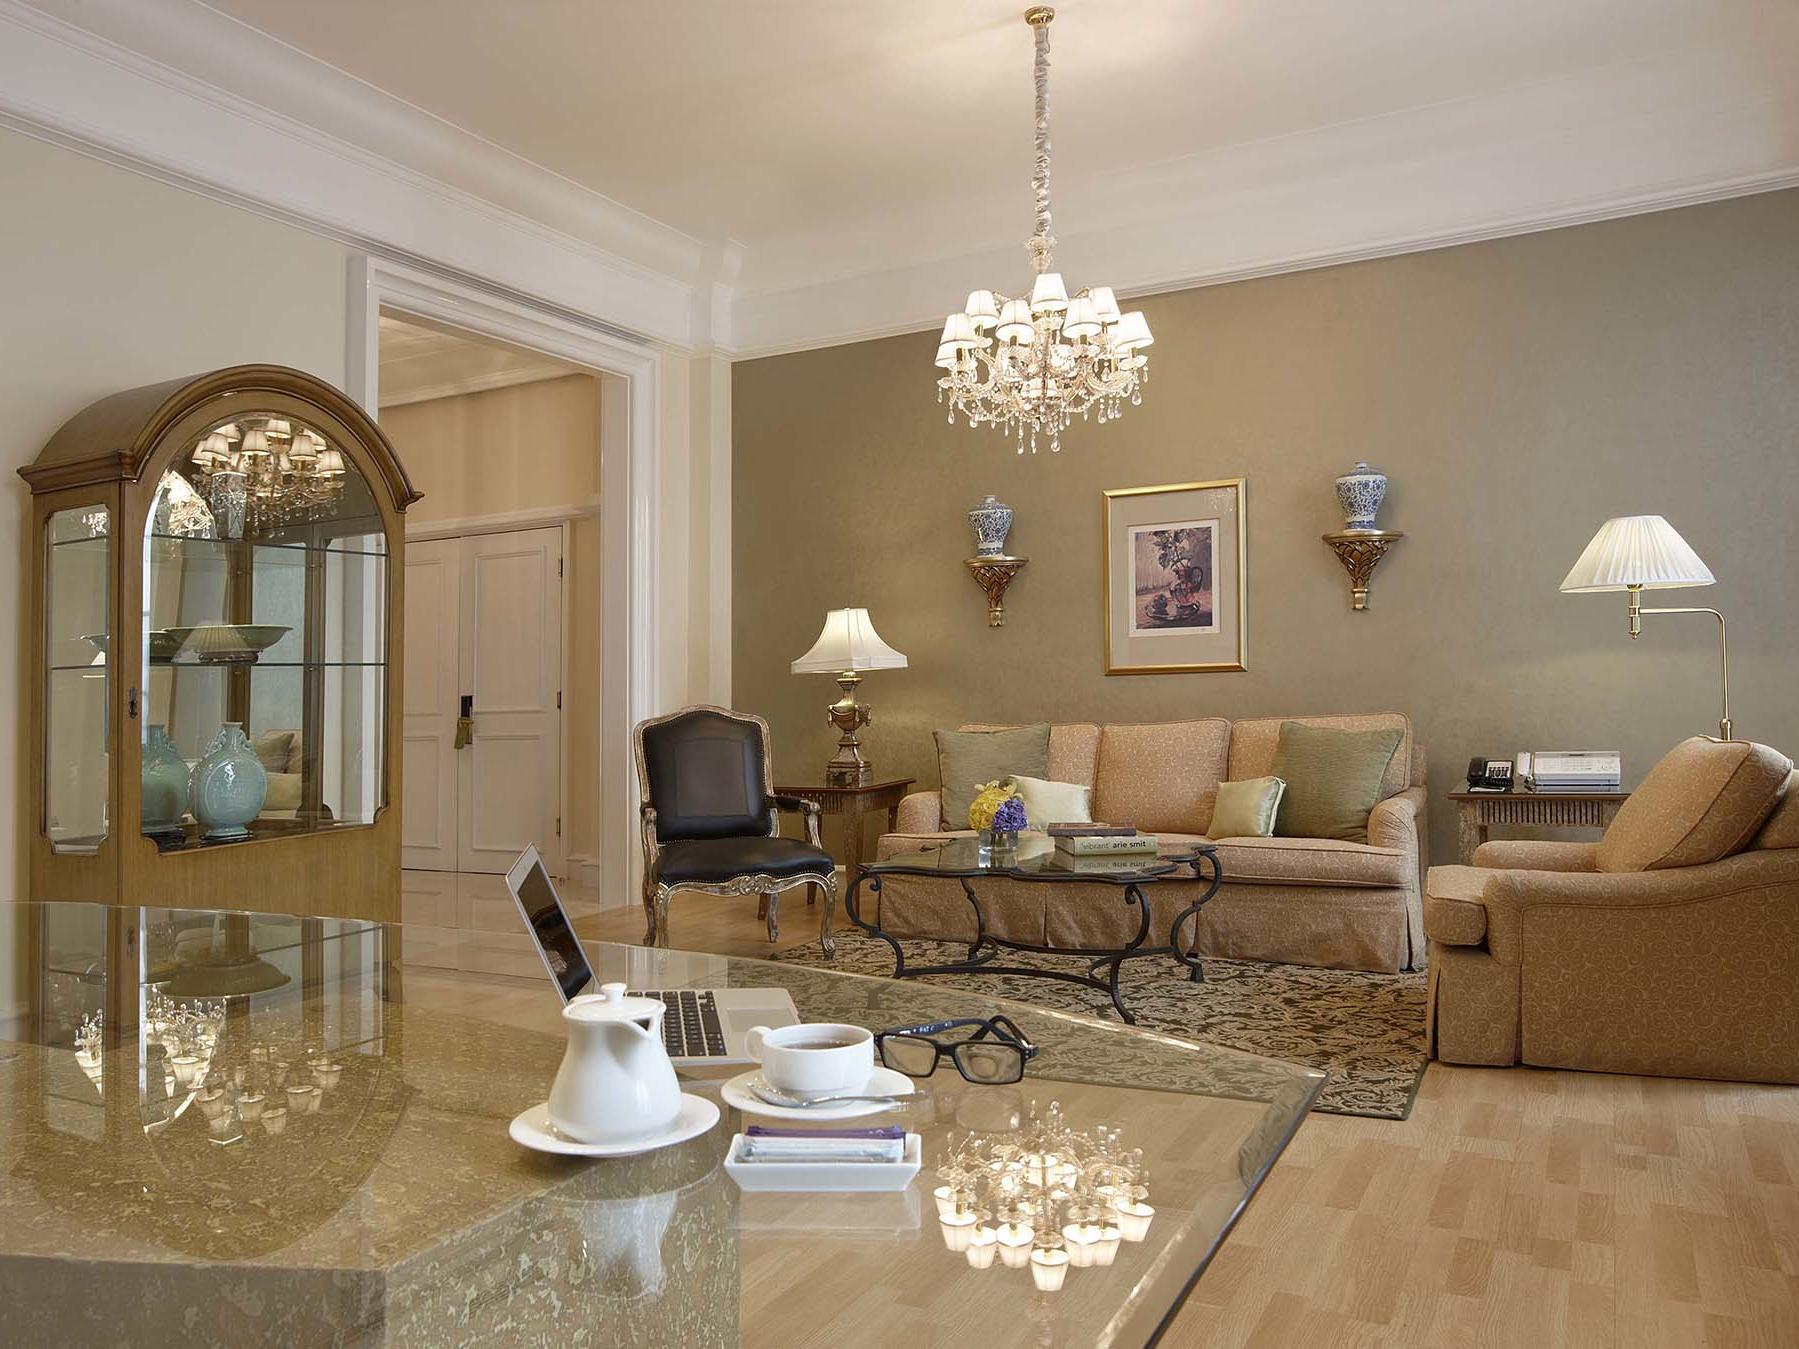 Mahakam Suite at Hotel Gran Mahakam in Jakarta, Indonesia